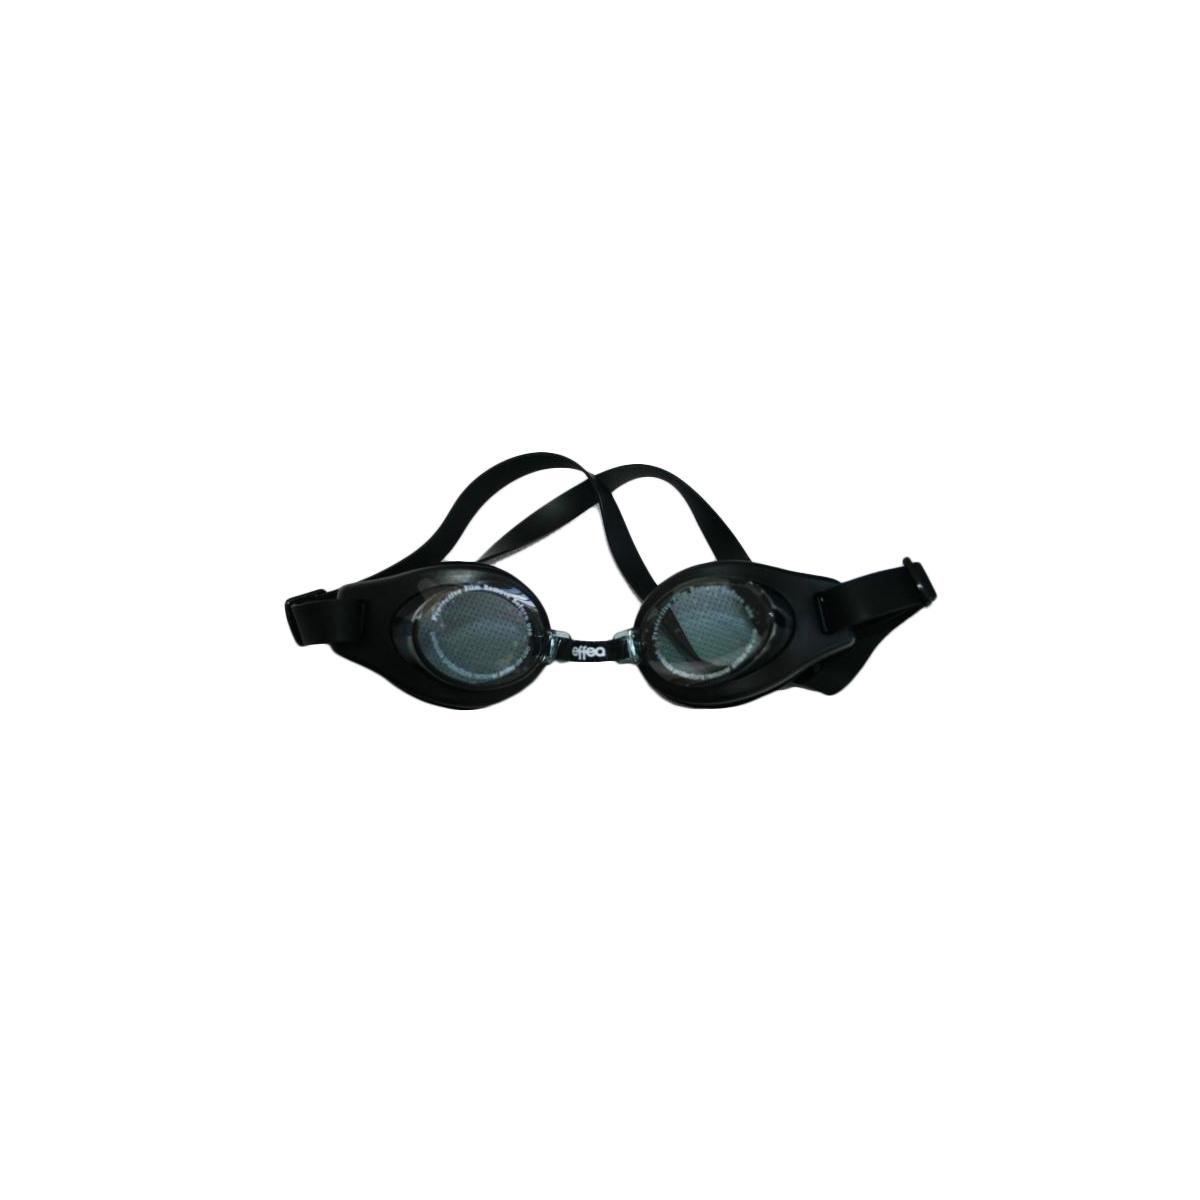 Plavecké brýle EFFEA 2620 junior - černé